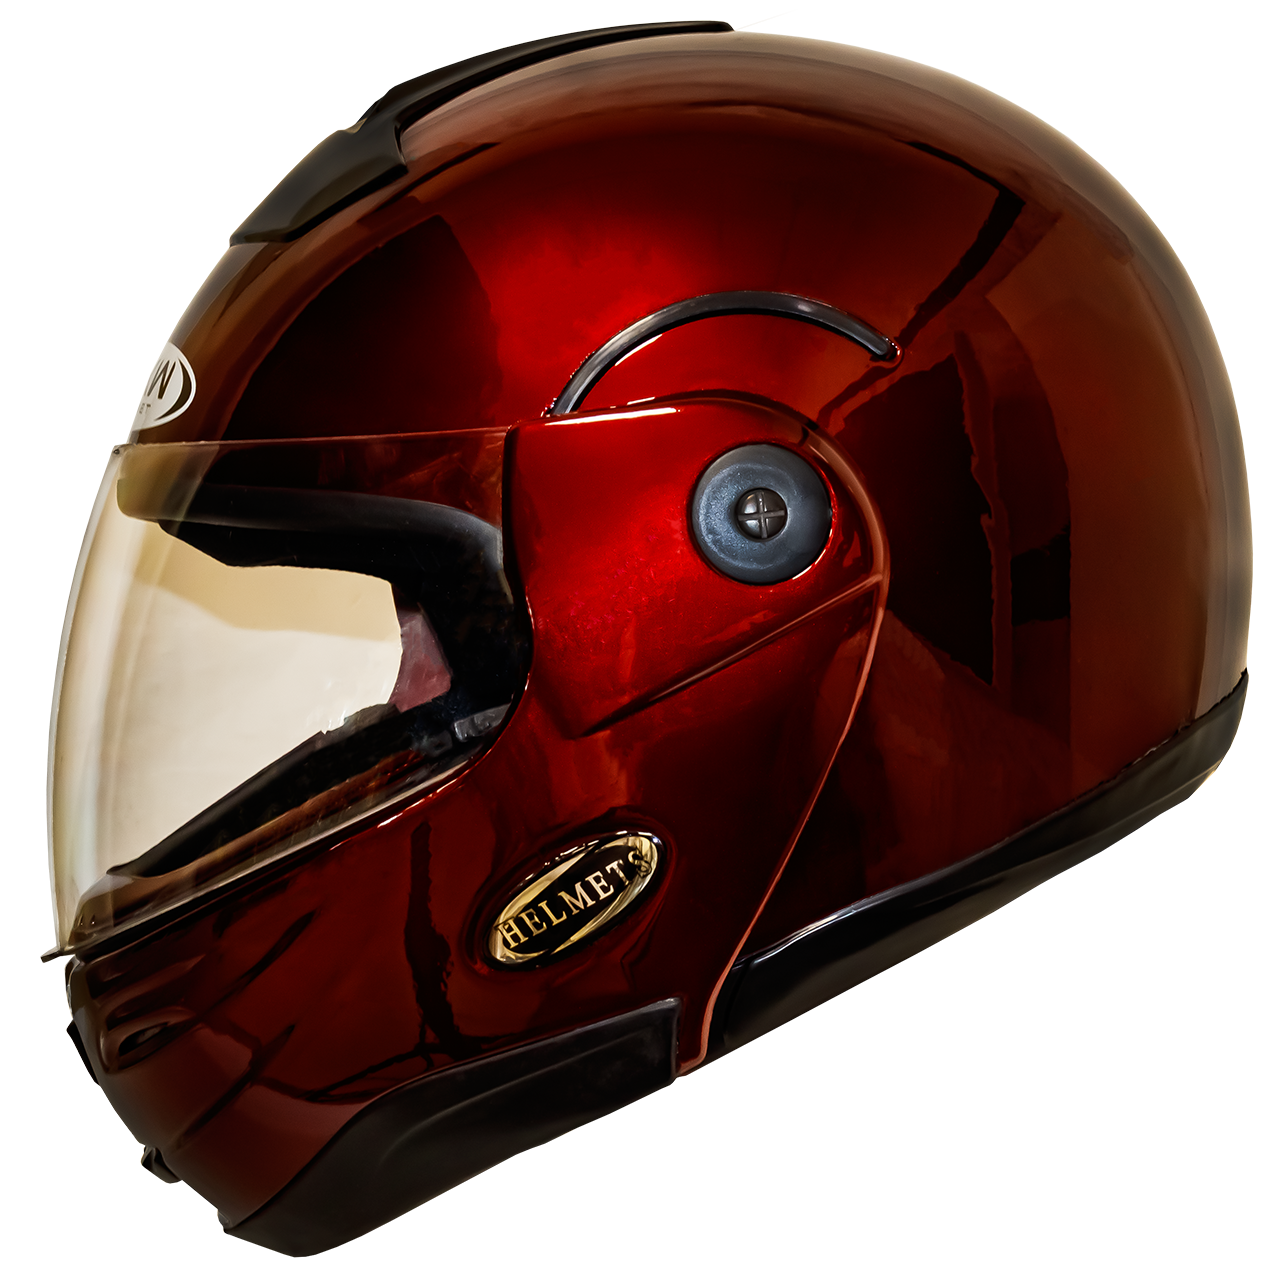 Мотошлем HF-108 solid red шлем трансформер, Flip-Up модуляр глянцевый красный